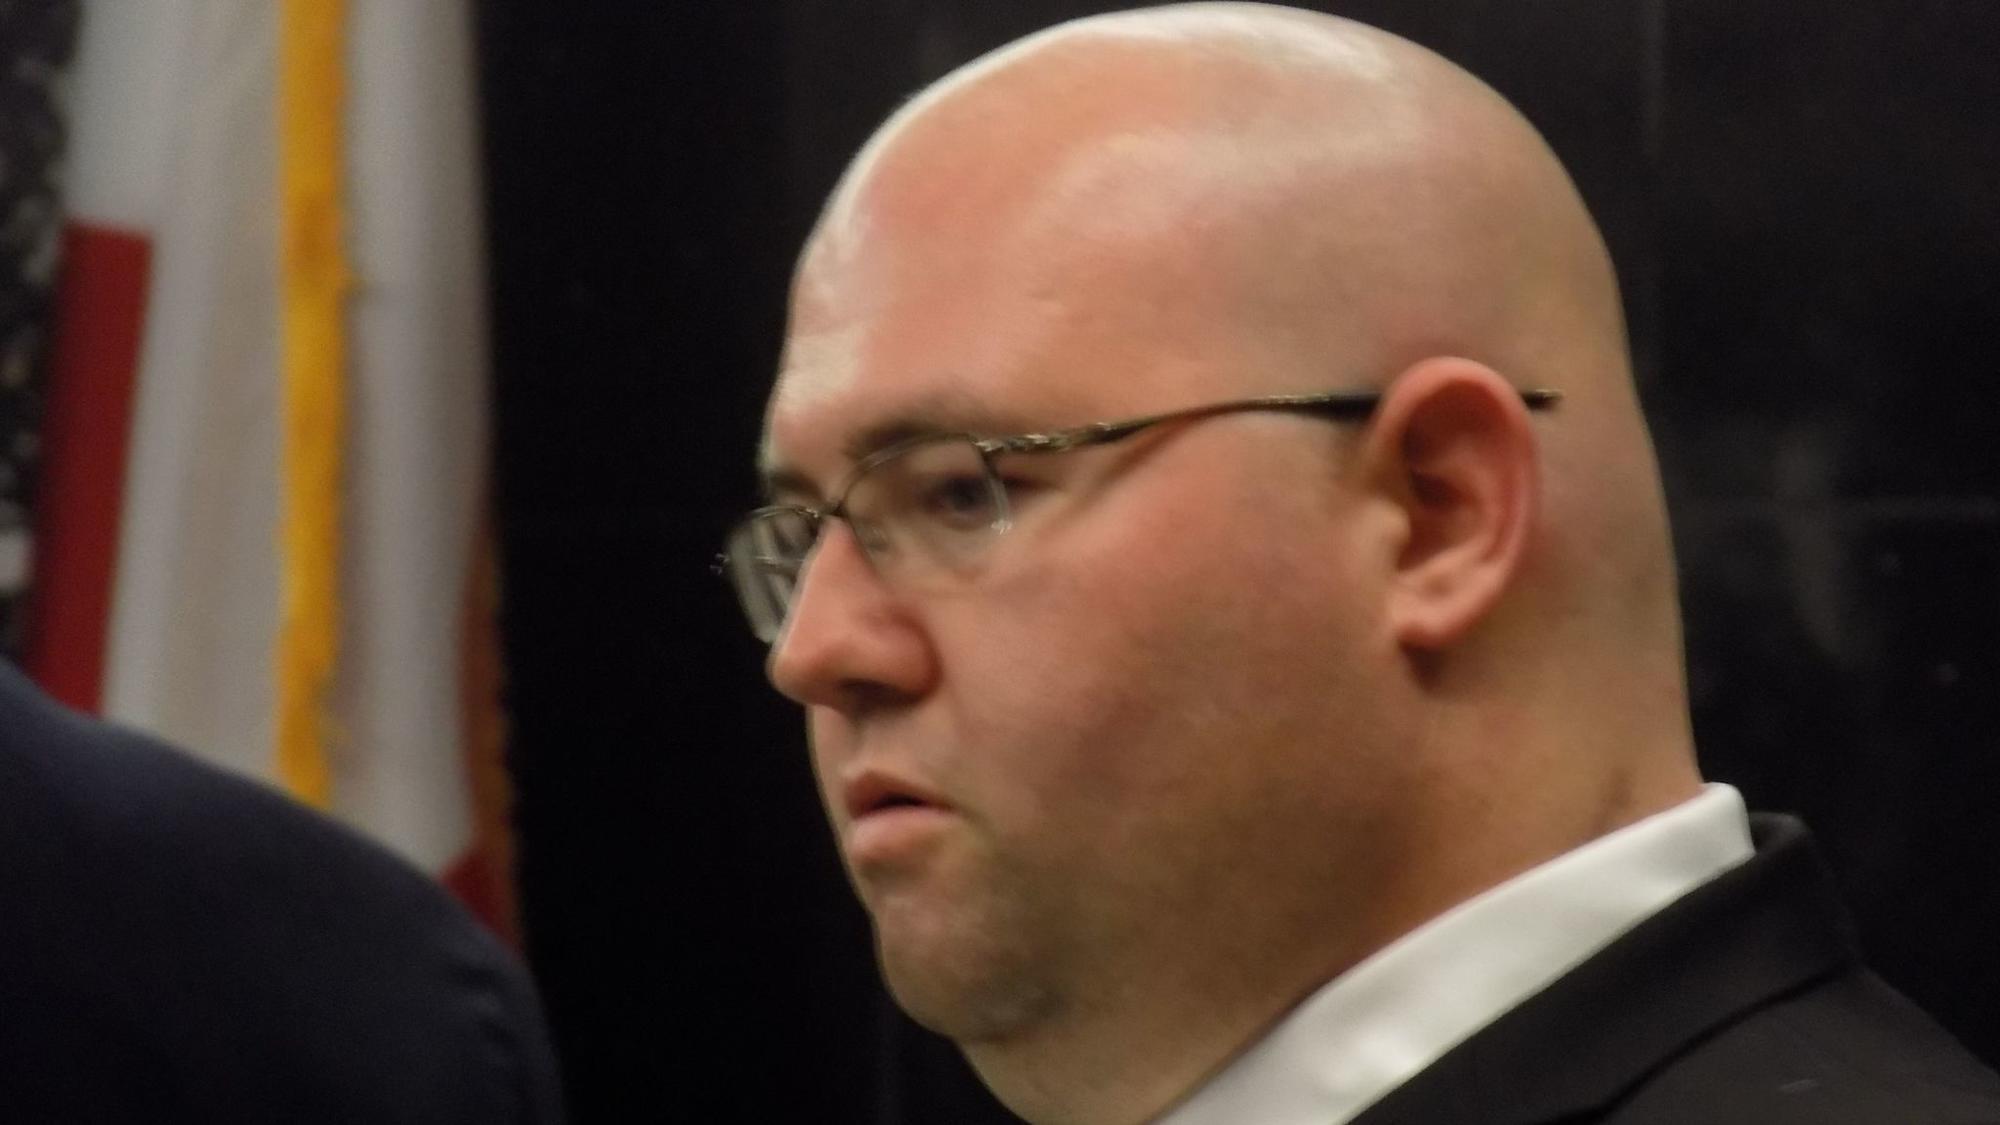 Palm Beach County Sheriff S Deputy Brandon Hegele